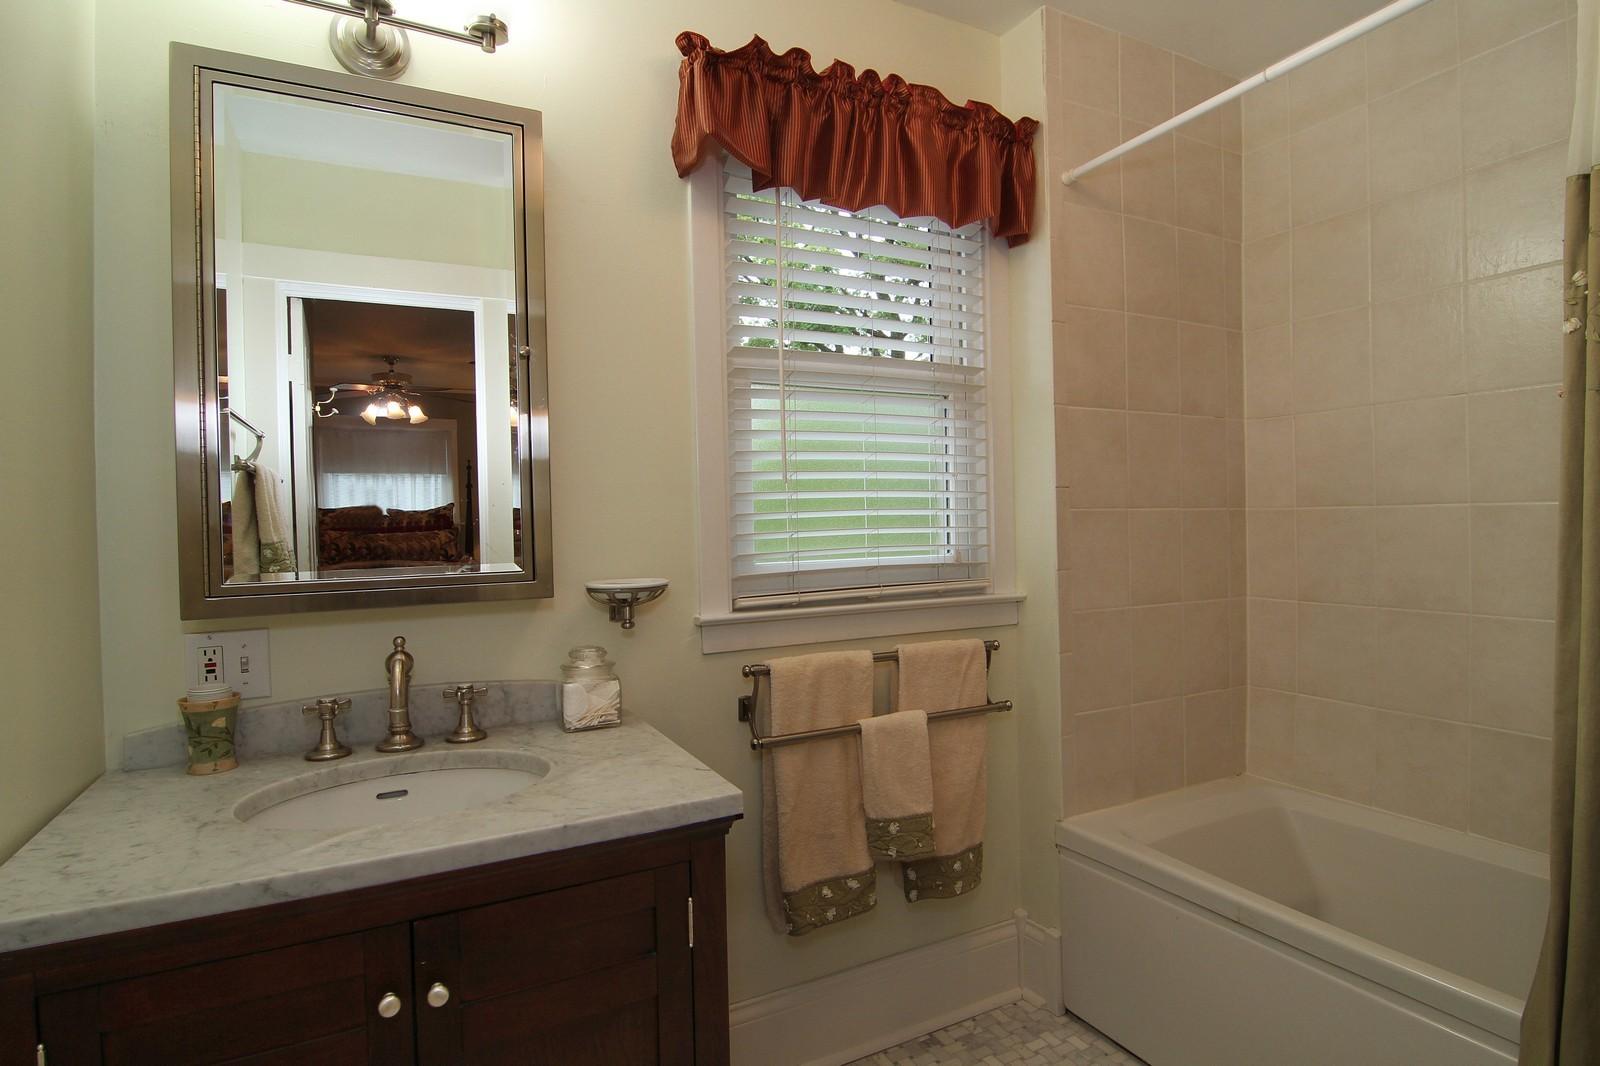 Real Estate Photography - 228 LaGrange Rd, La Grange, IL, 60525 - Bathroom